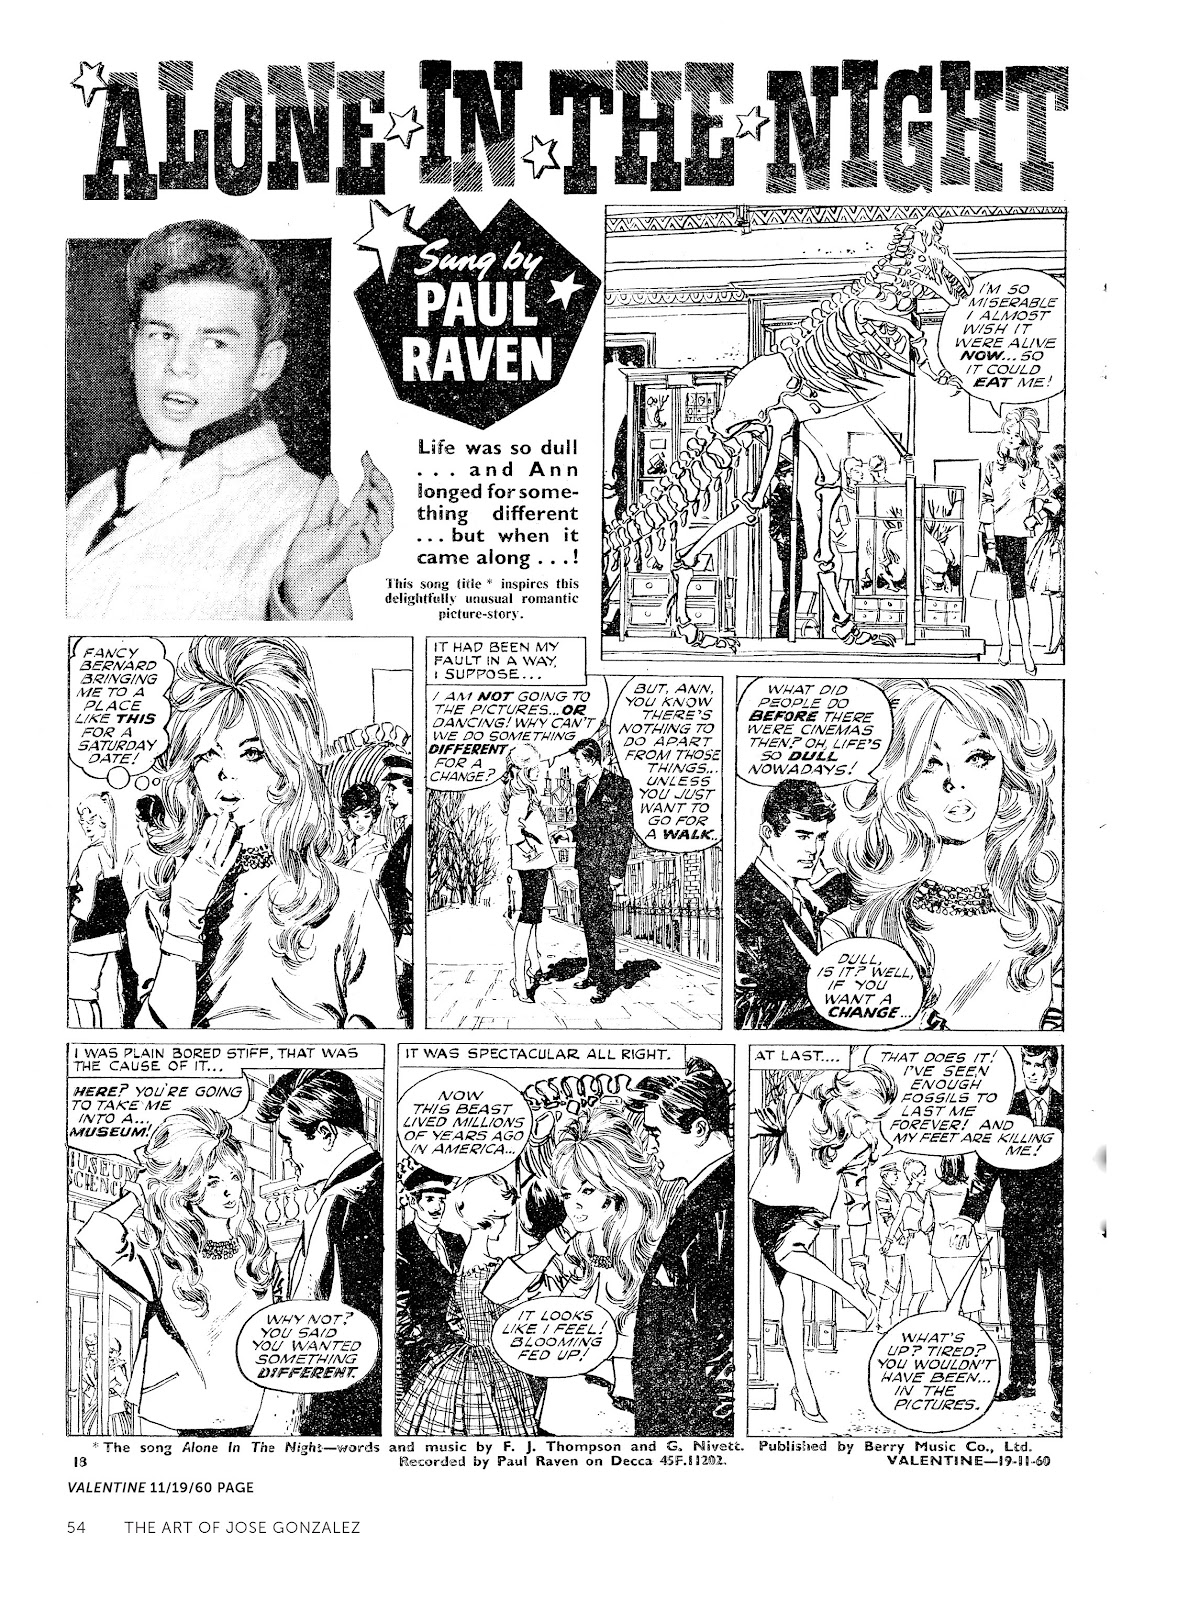 Read online The Art of Jose Gonzalez comic -  Issue # TPB (Part 1) - 55